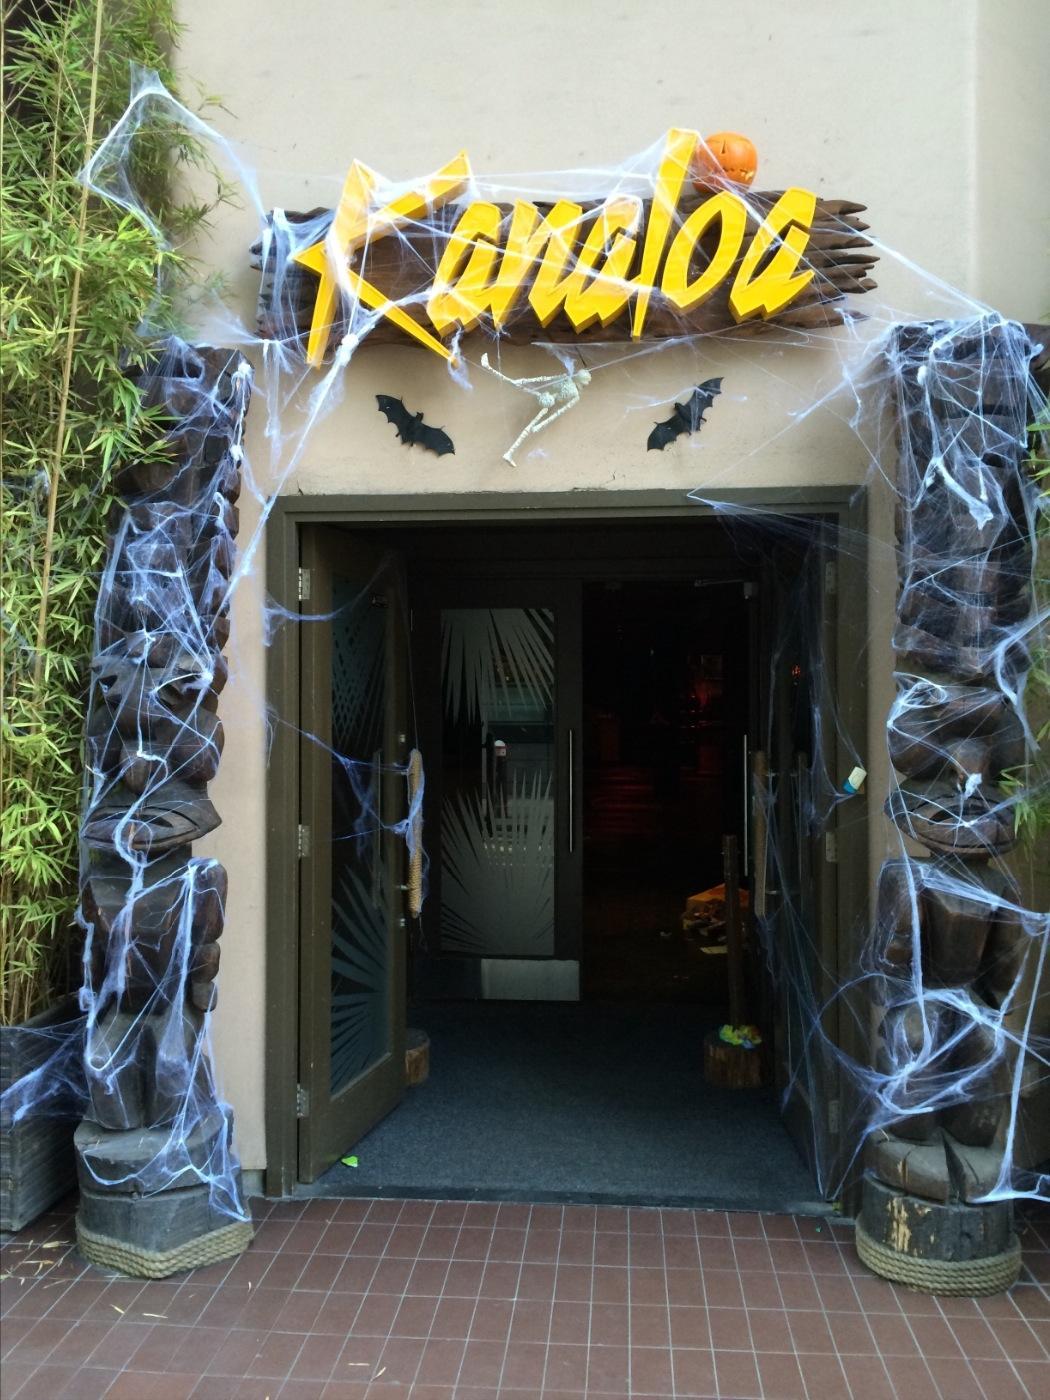 RT @kanaloaclub: Preparing for tonight #Halloween #kanaloaclub #london #cocktails  👀 😬 👯 #dancing #limbo @RoughCopyUK # http://t.co/vnBfuUx…